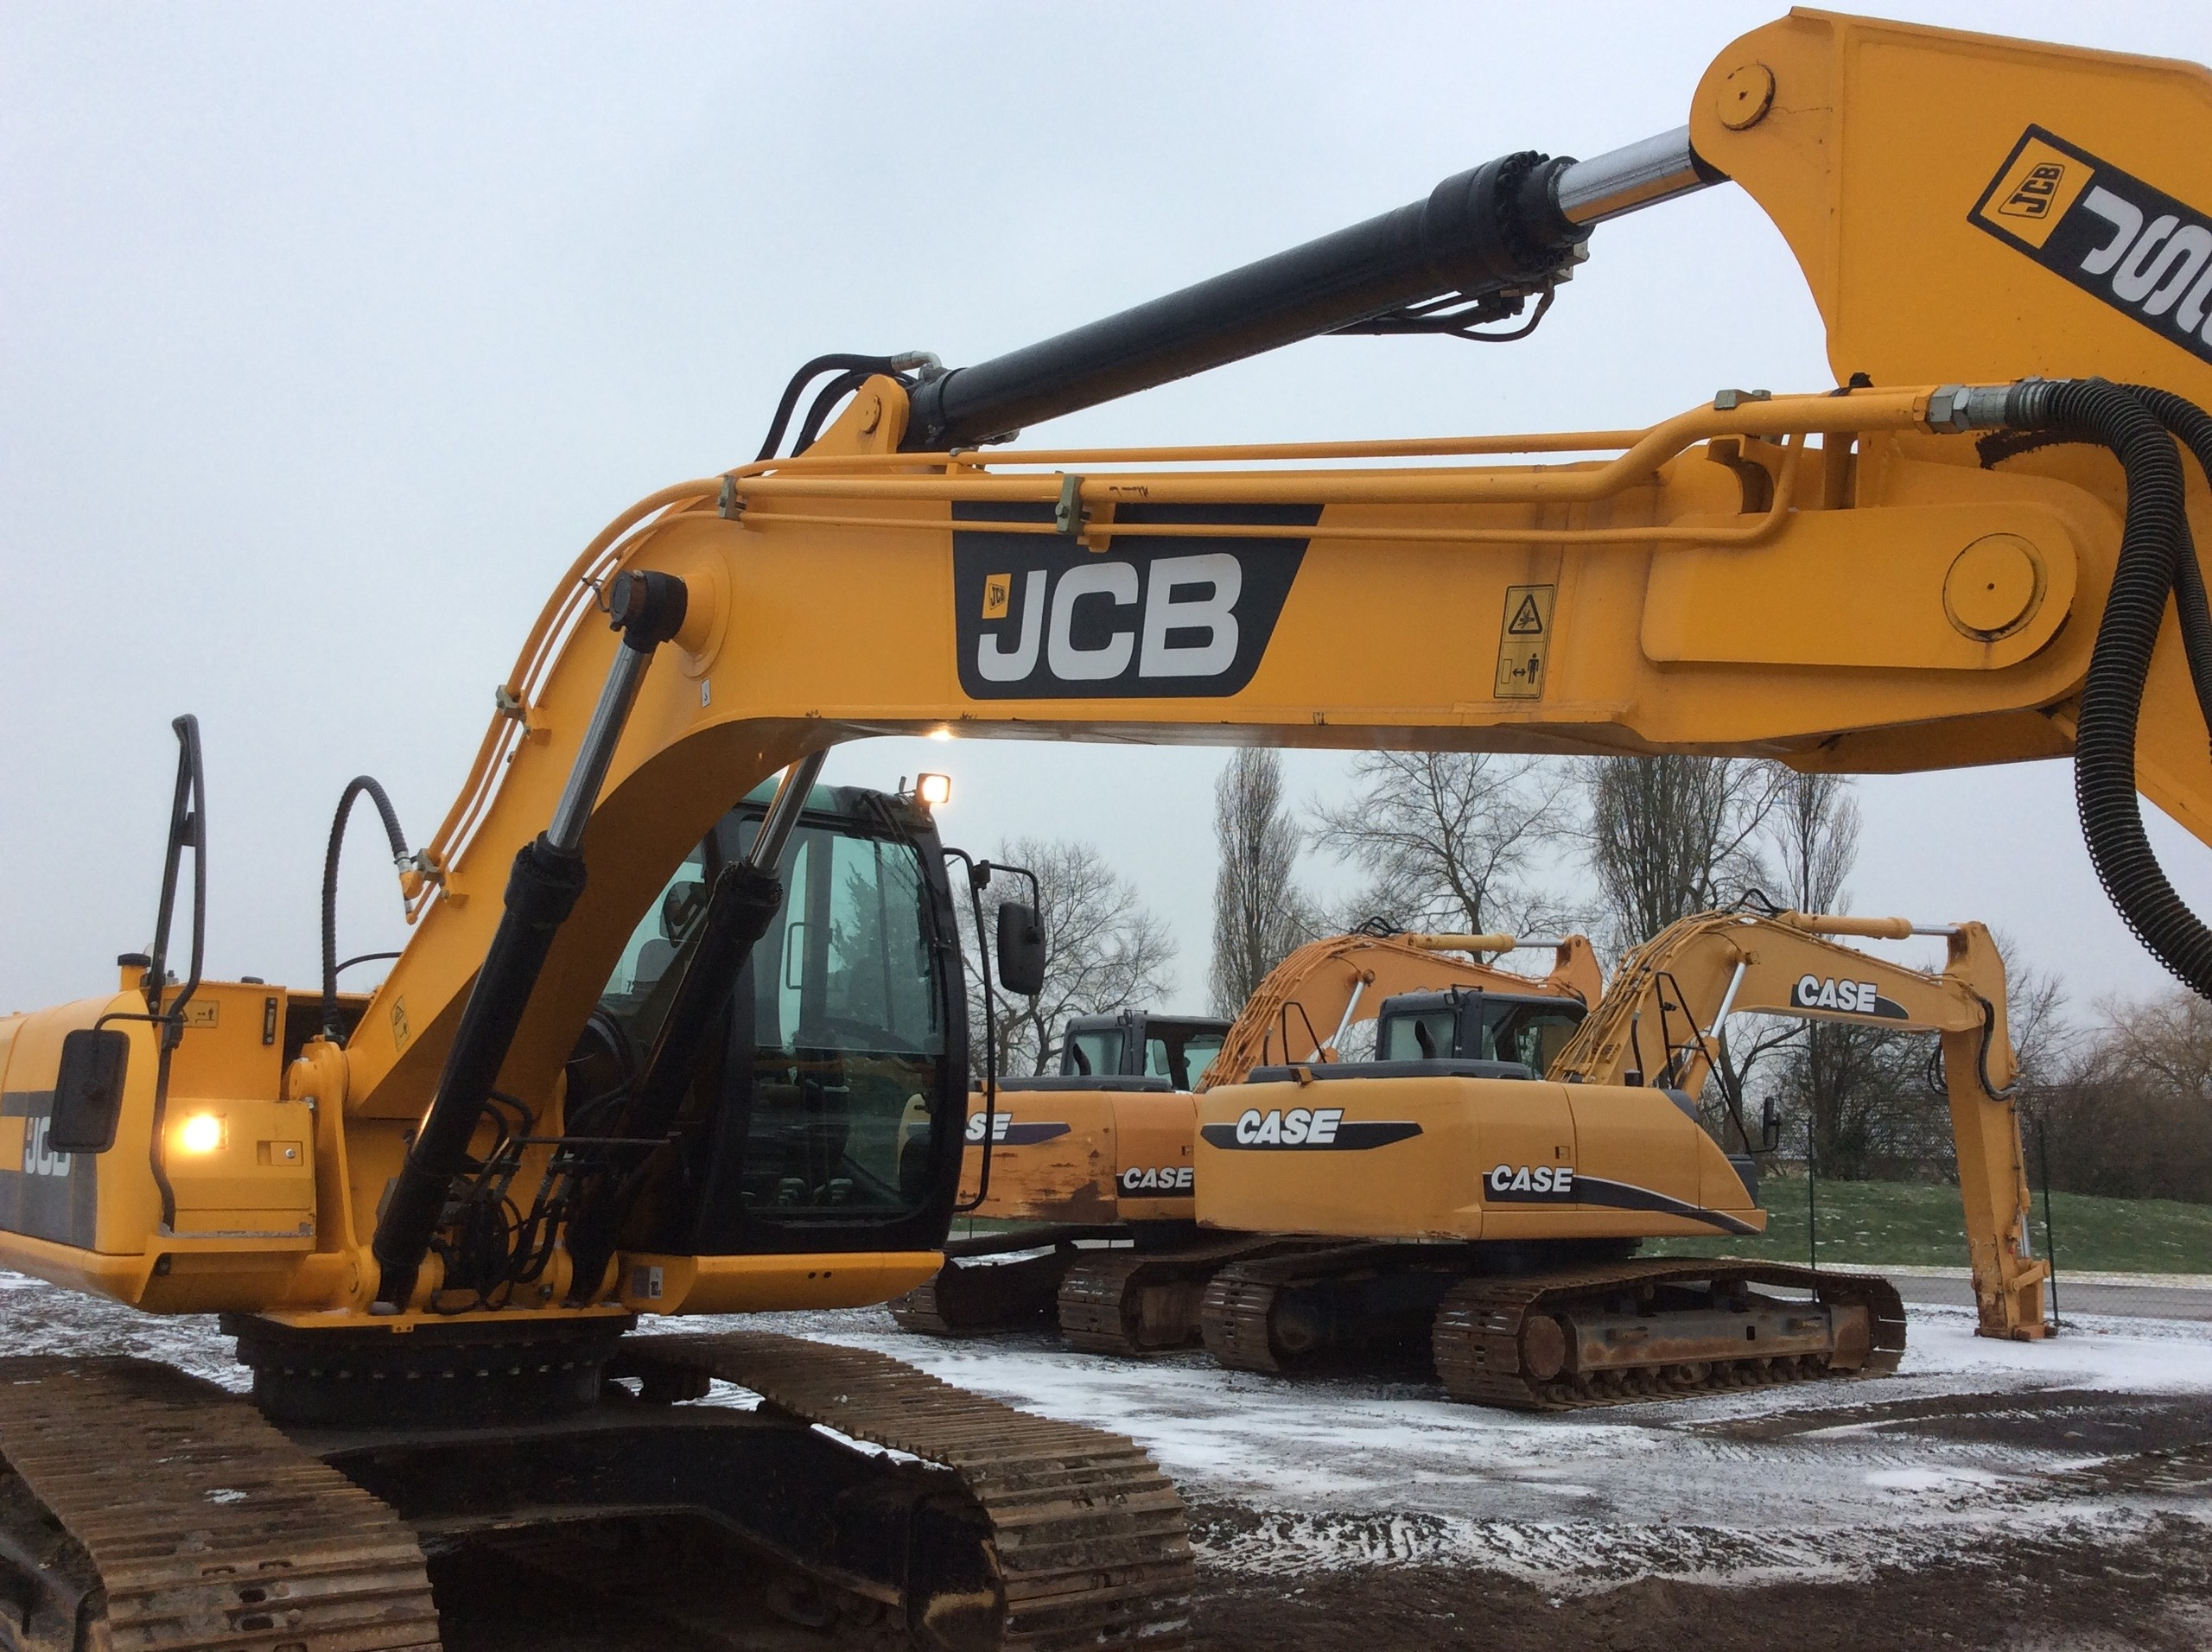 2012 - JCB JS240NLC